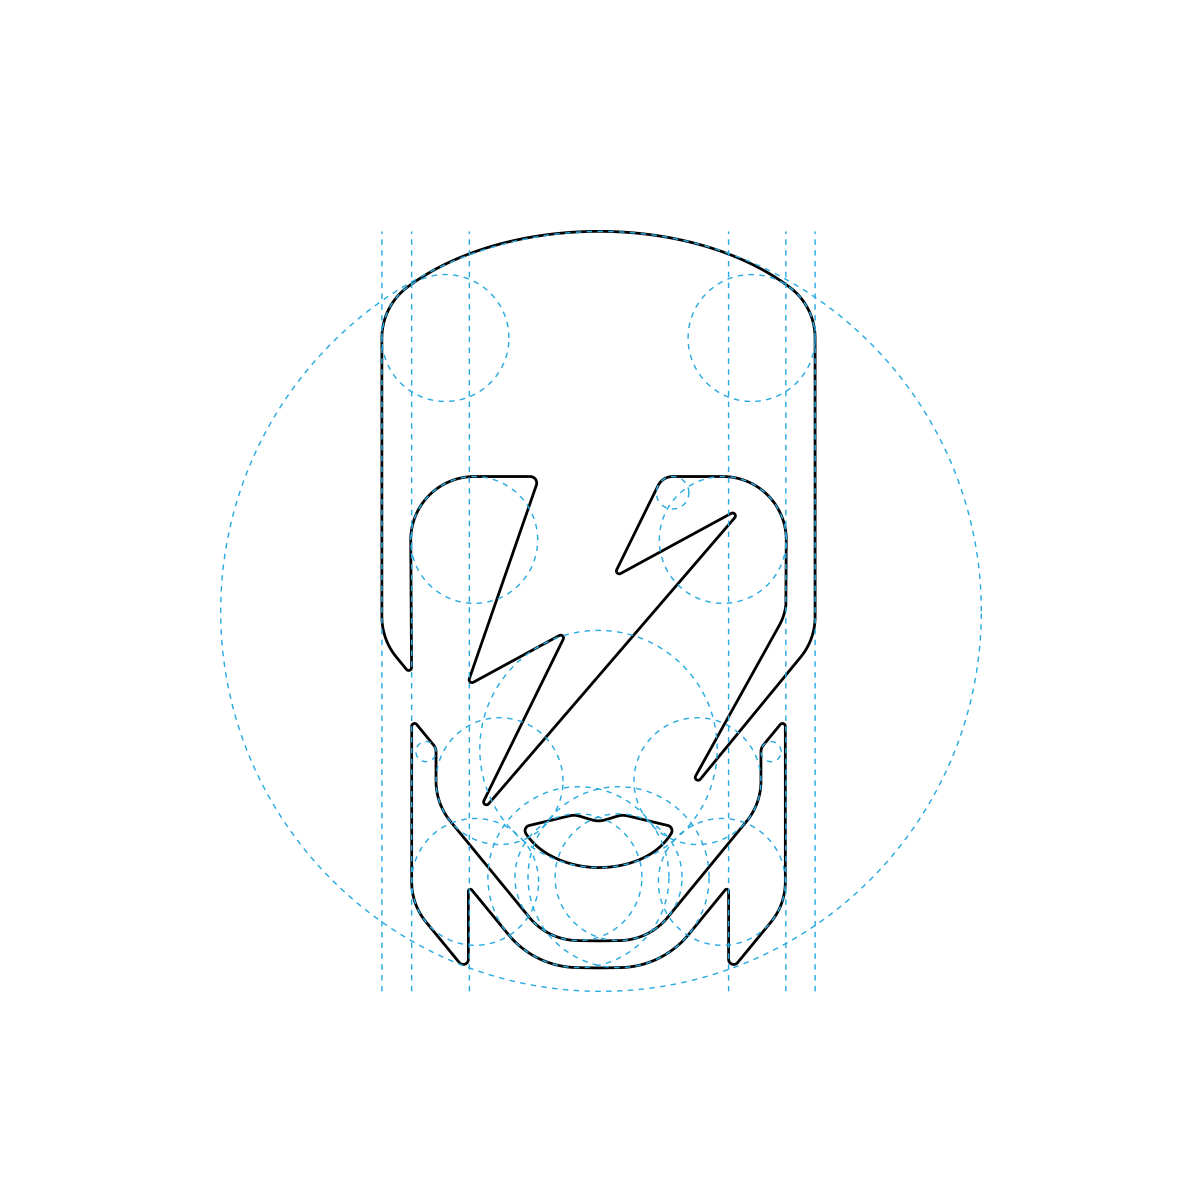 David bowie icon 1